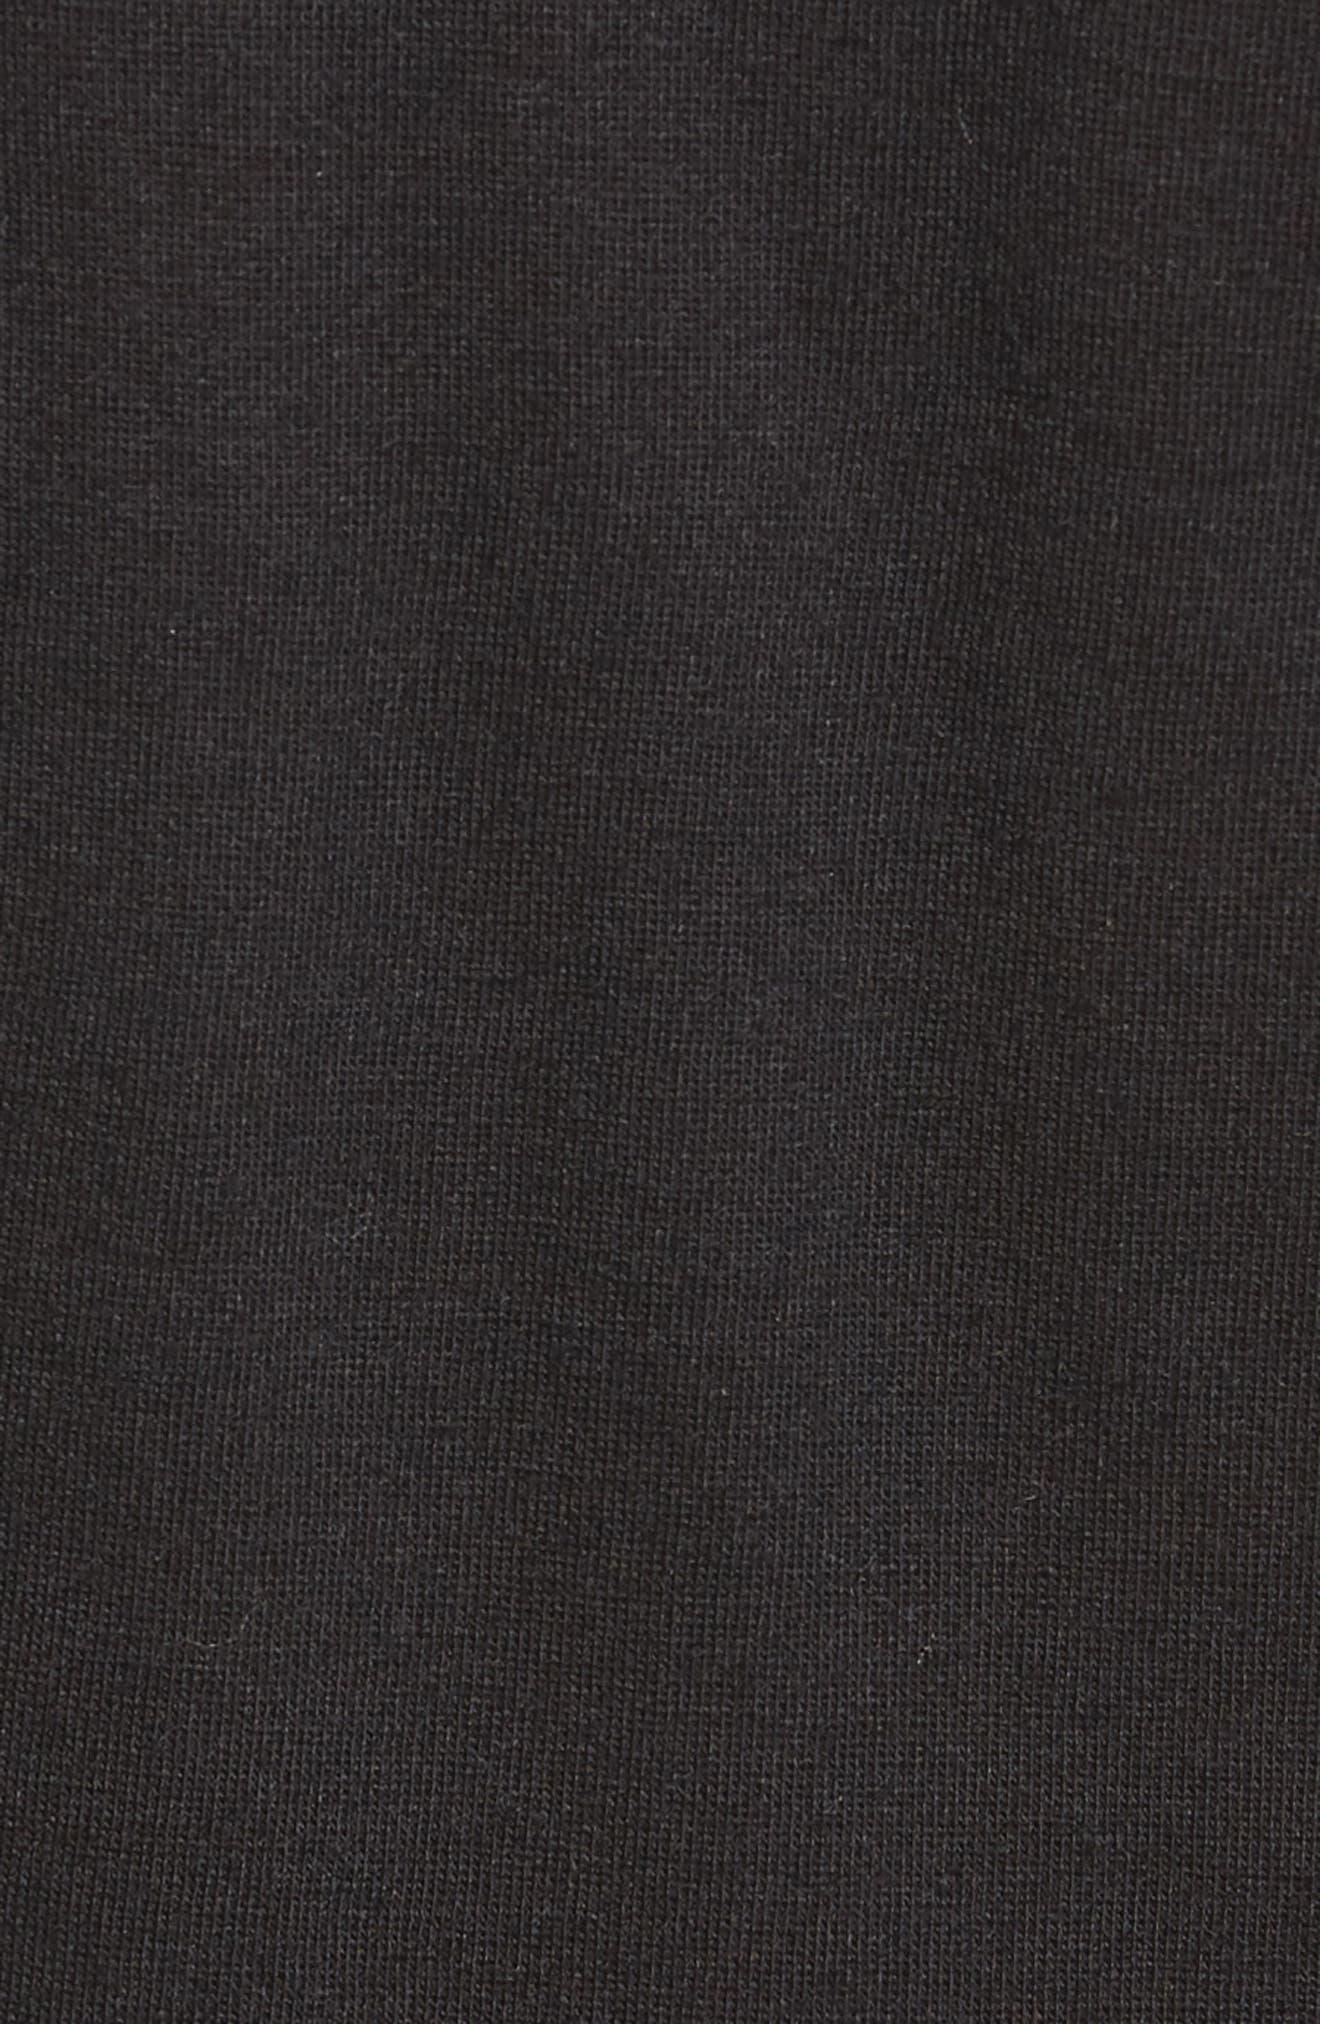 Side Tie Knit Top,                             Alternate thumbnail 5, color,                             001